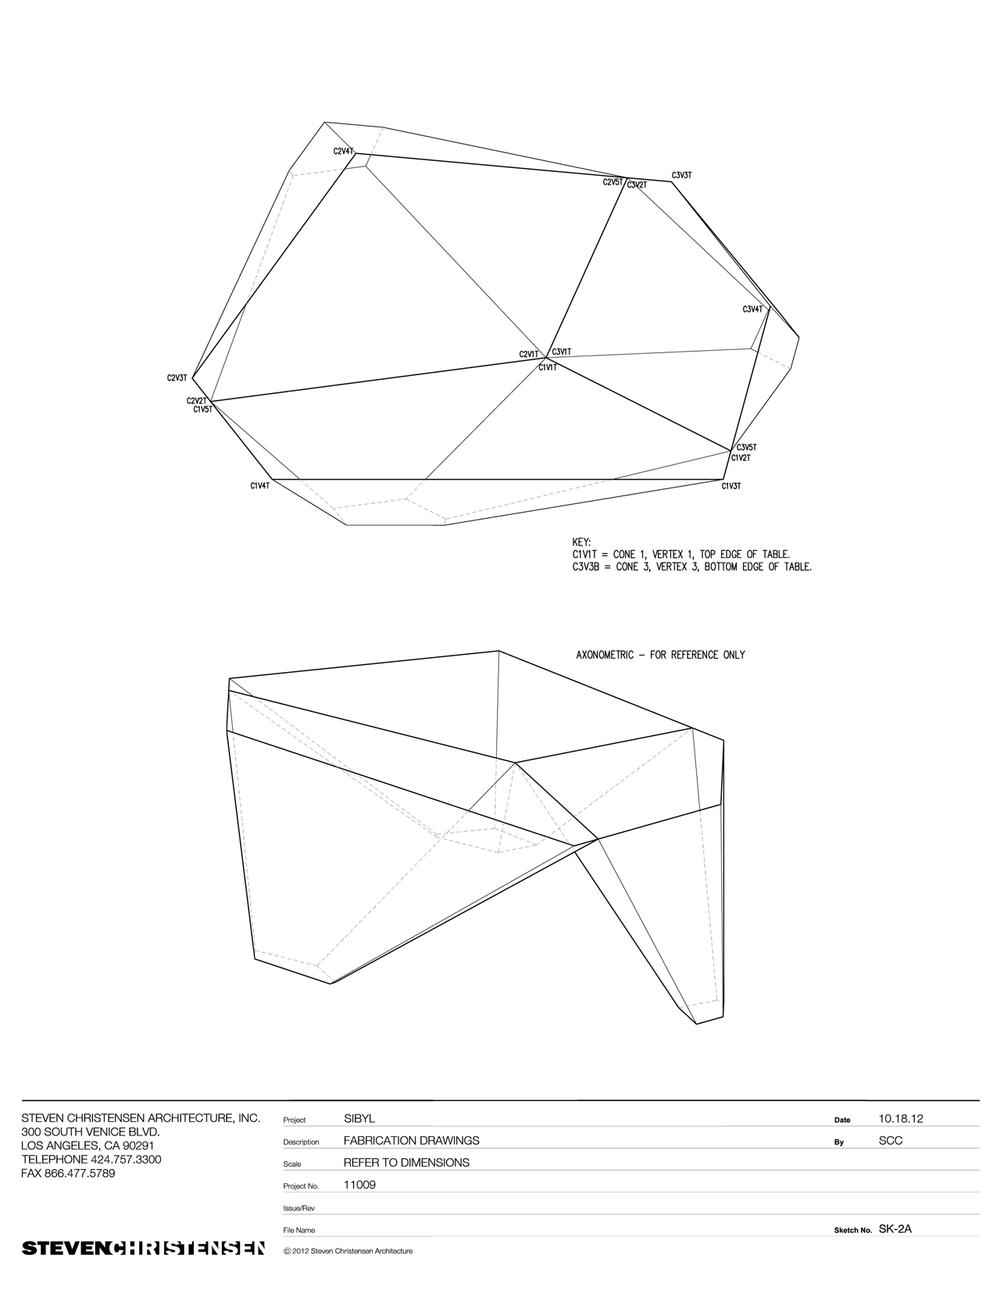 steven-christensen_sibyl_fabrication-drawings_2A_1280.png